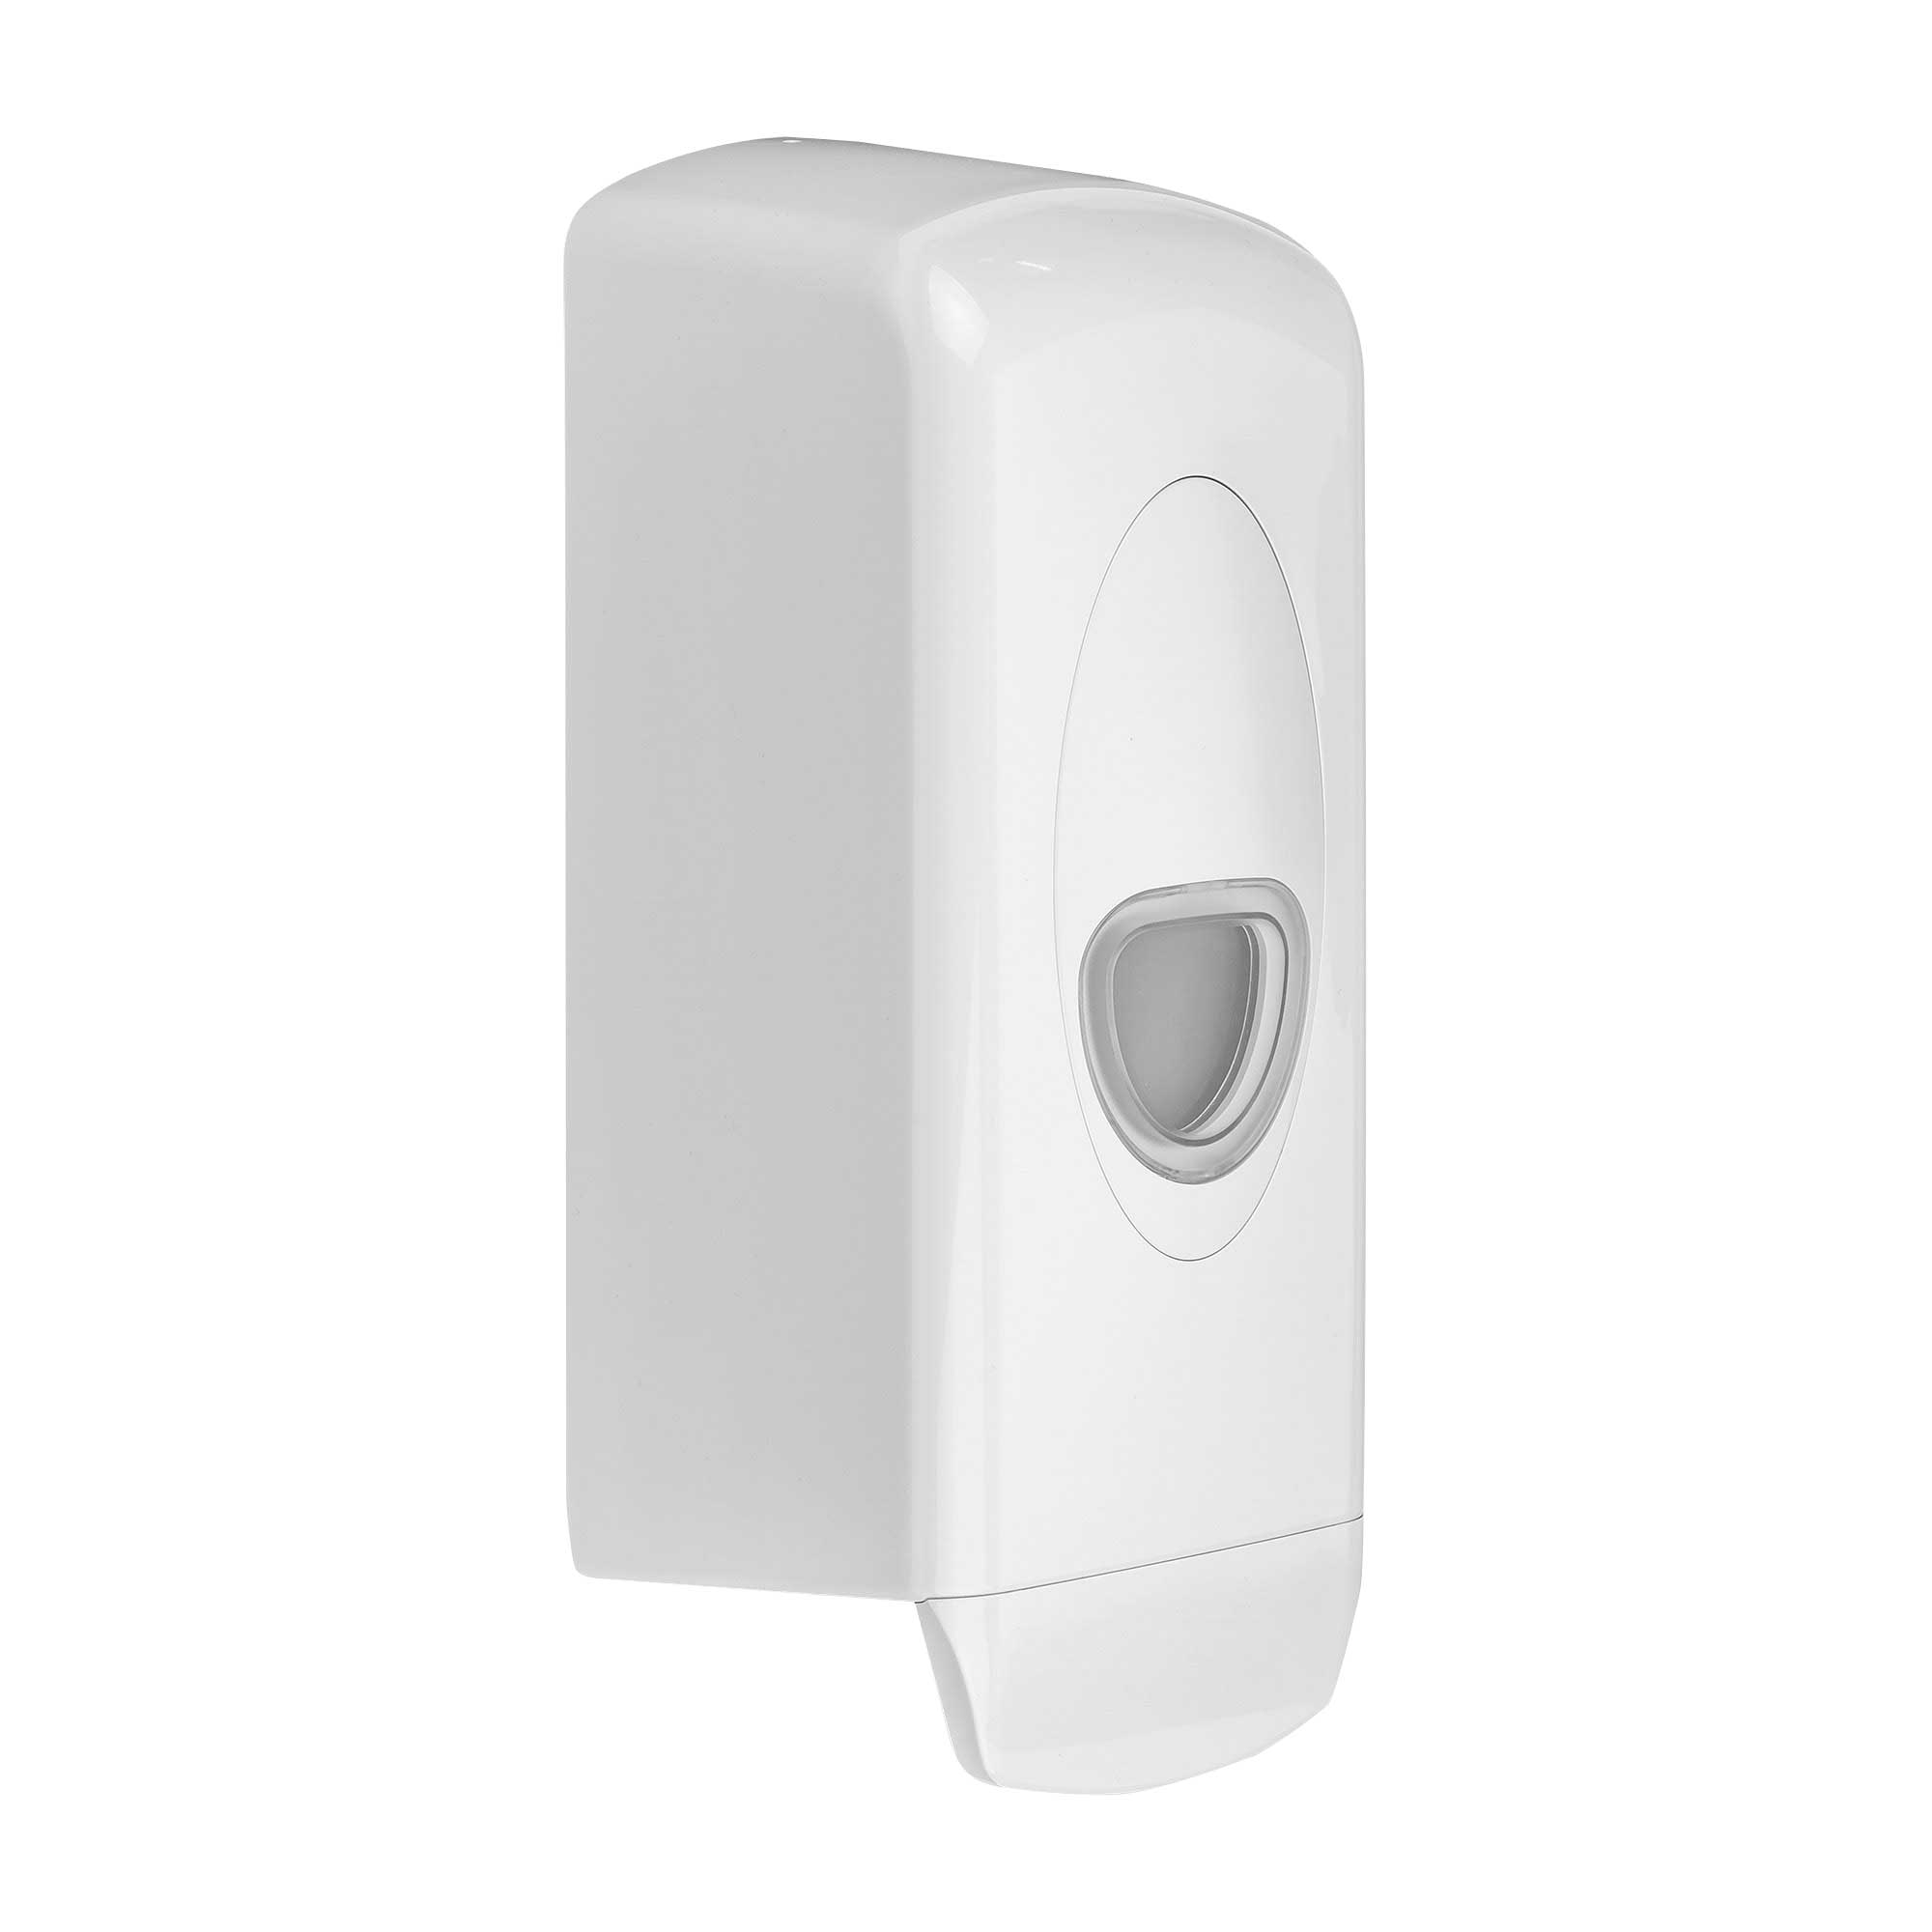 BULK REFILLABLE FOAM SOAP DISPENSER product image